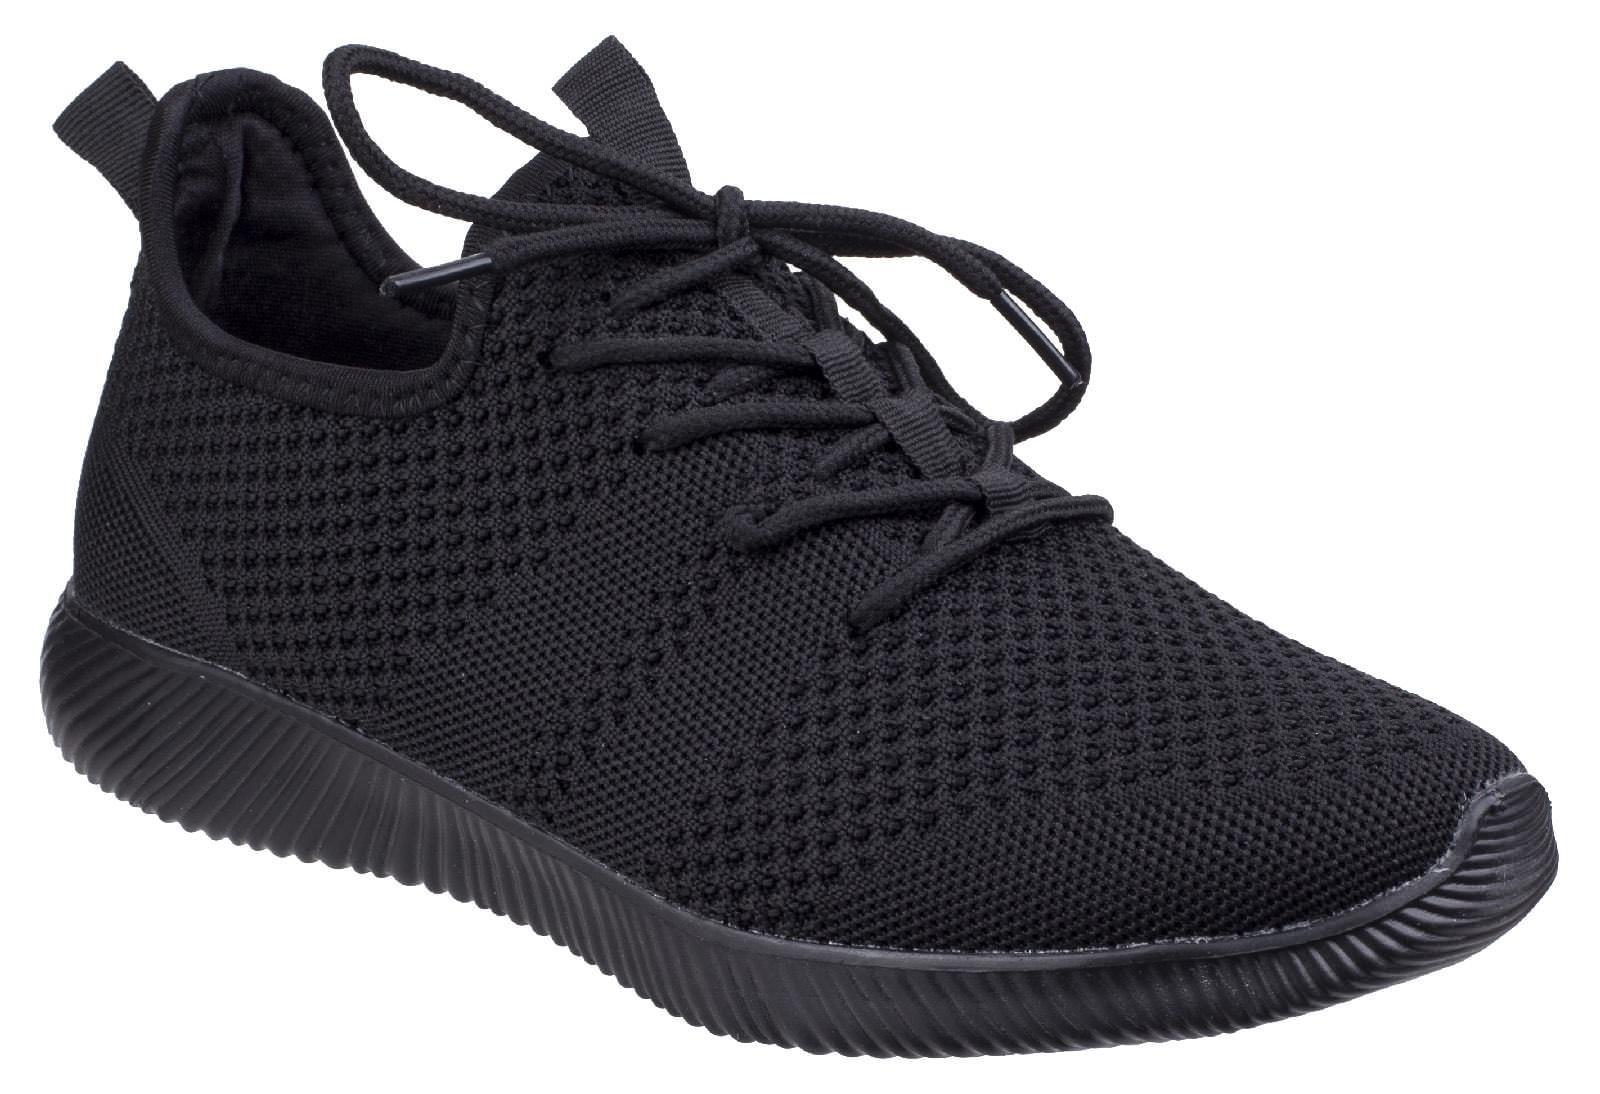 Divaz Heidi knit lightweight breathable sporty ladies trainer shoe